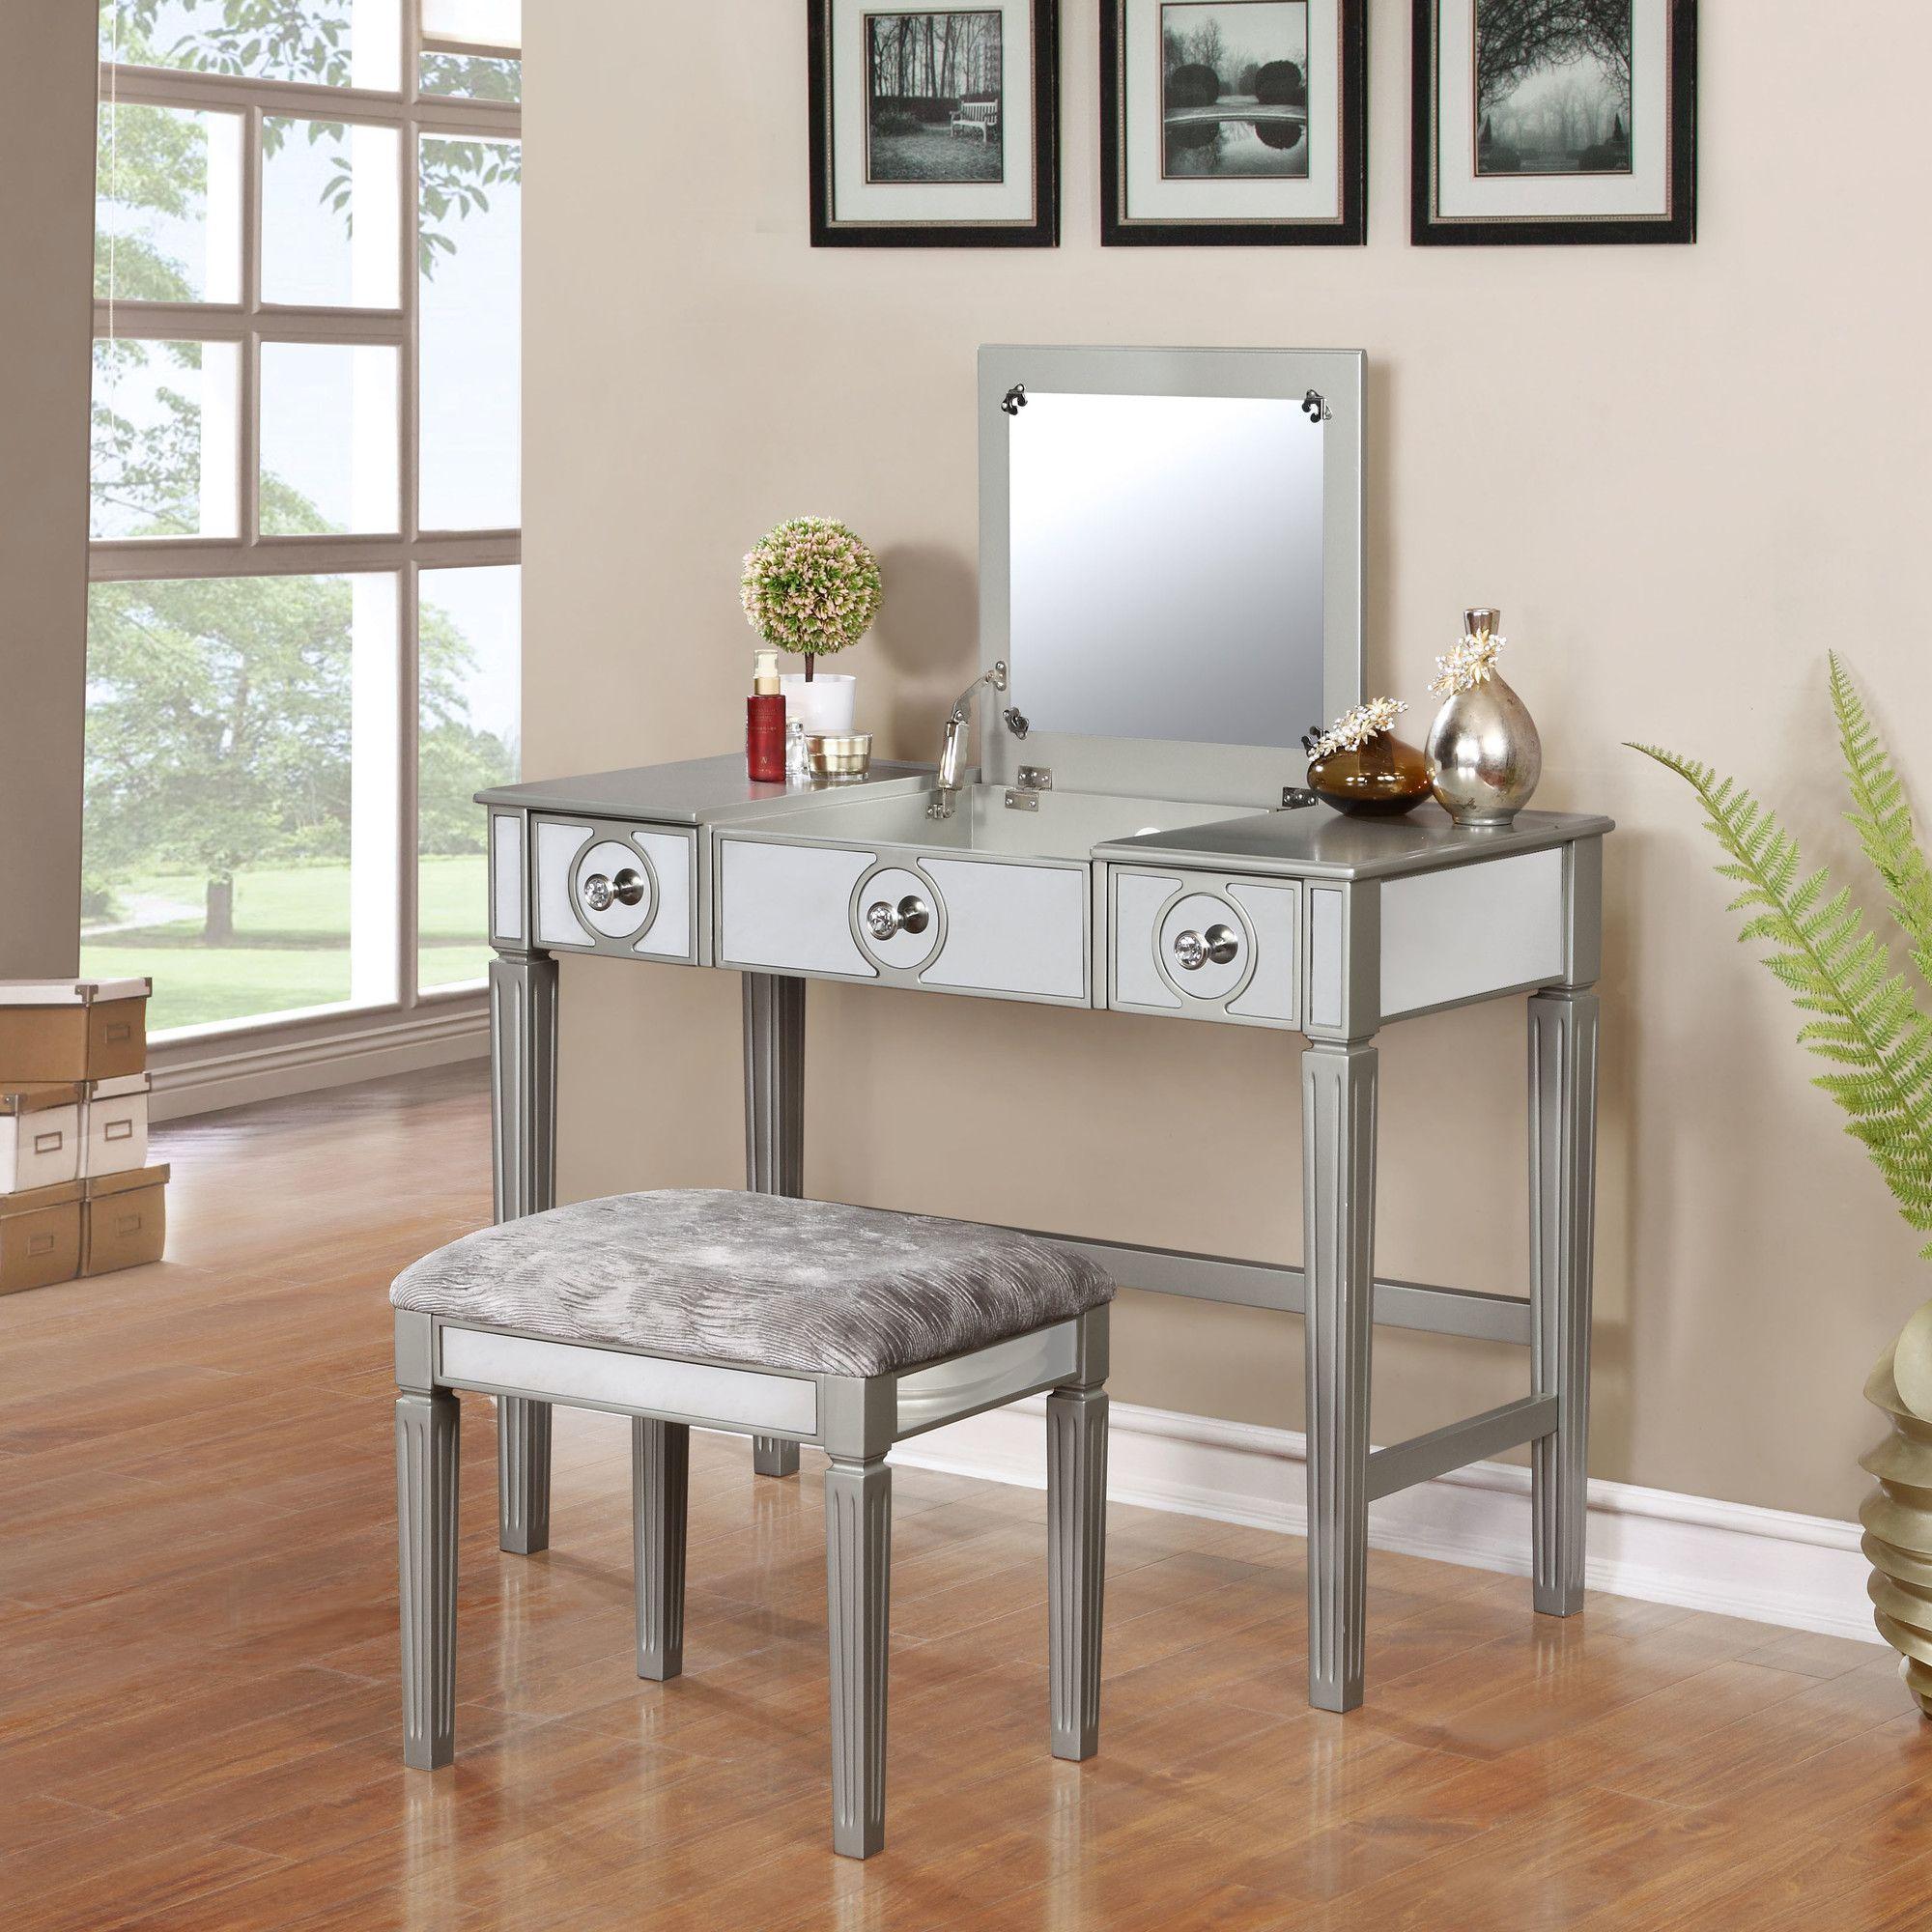 Mcclay Vanity Set With Mirror Vanity Set Vanity Set With Mirror Silver Vanity